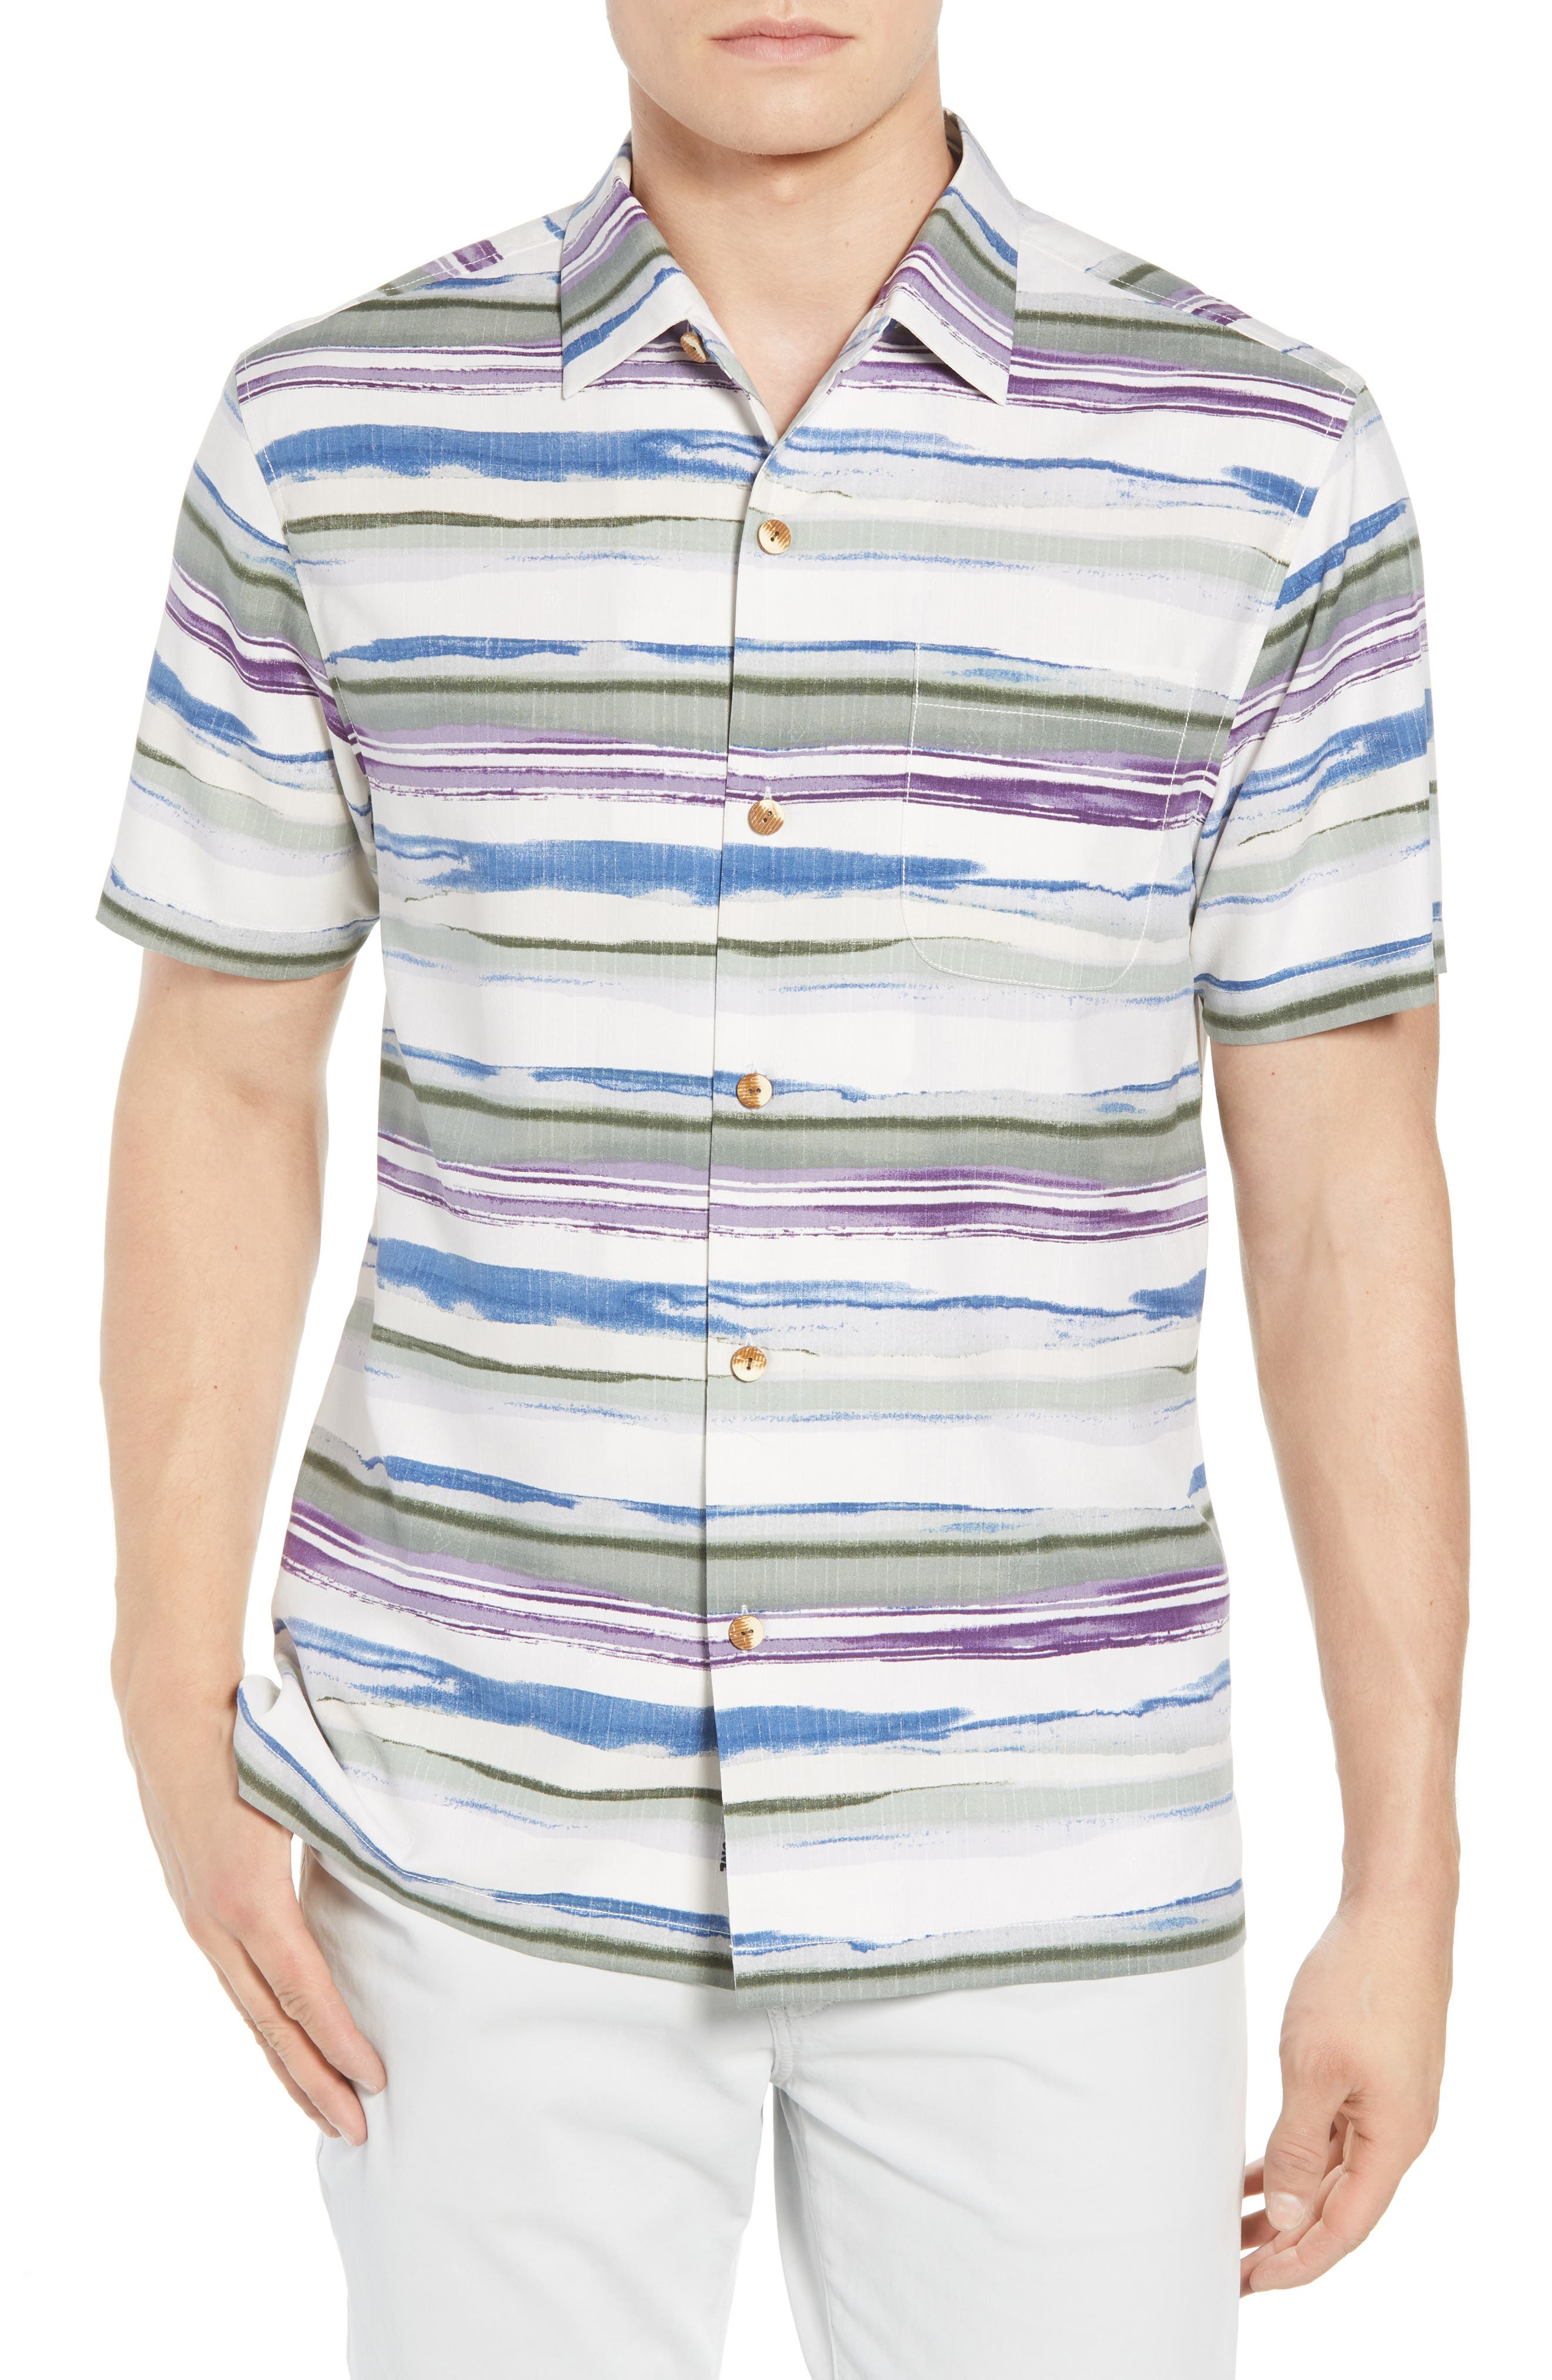 Hazy Horizons Silk Blend Camp Shirt,                         Main,                         color, 300